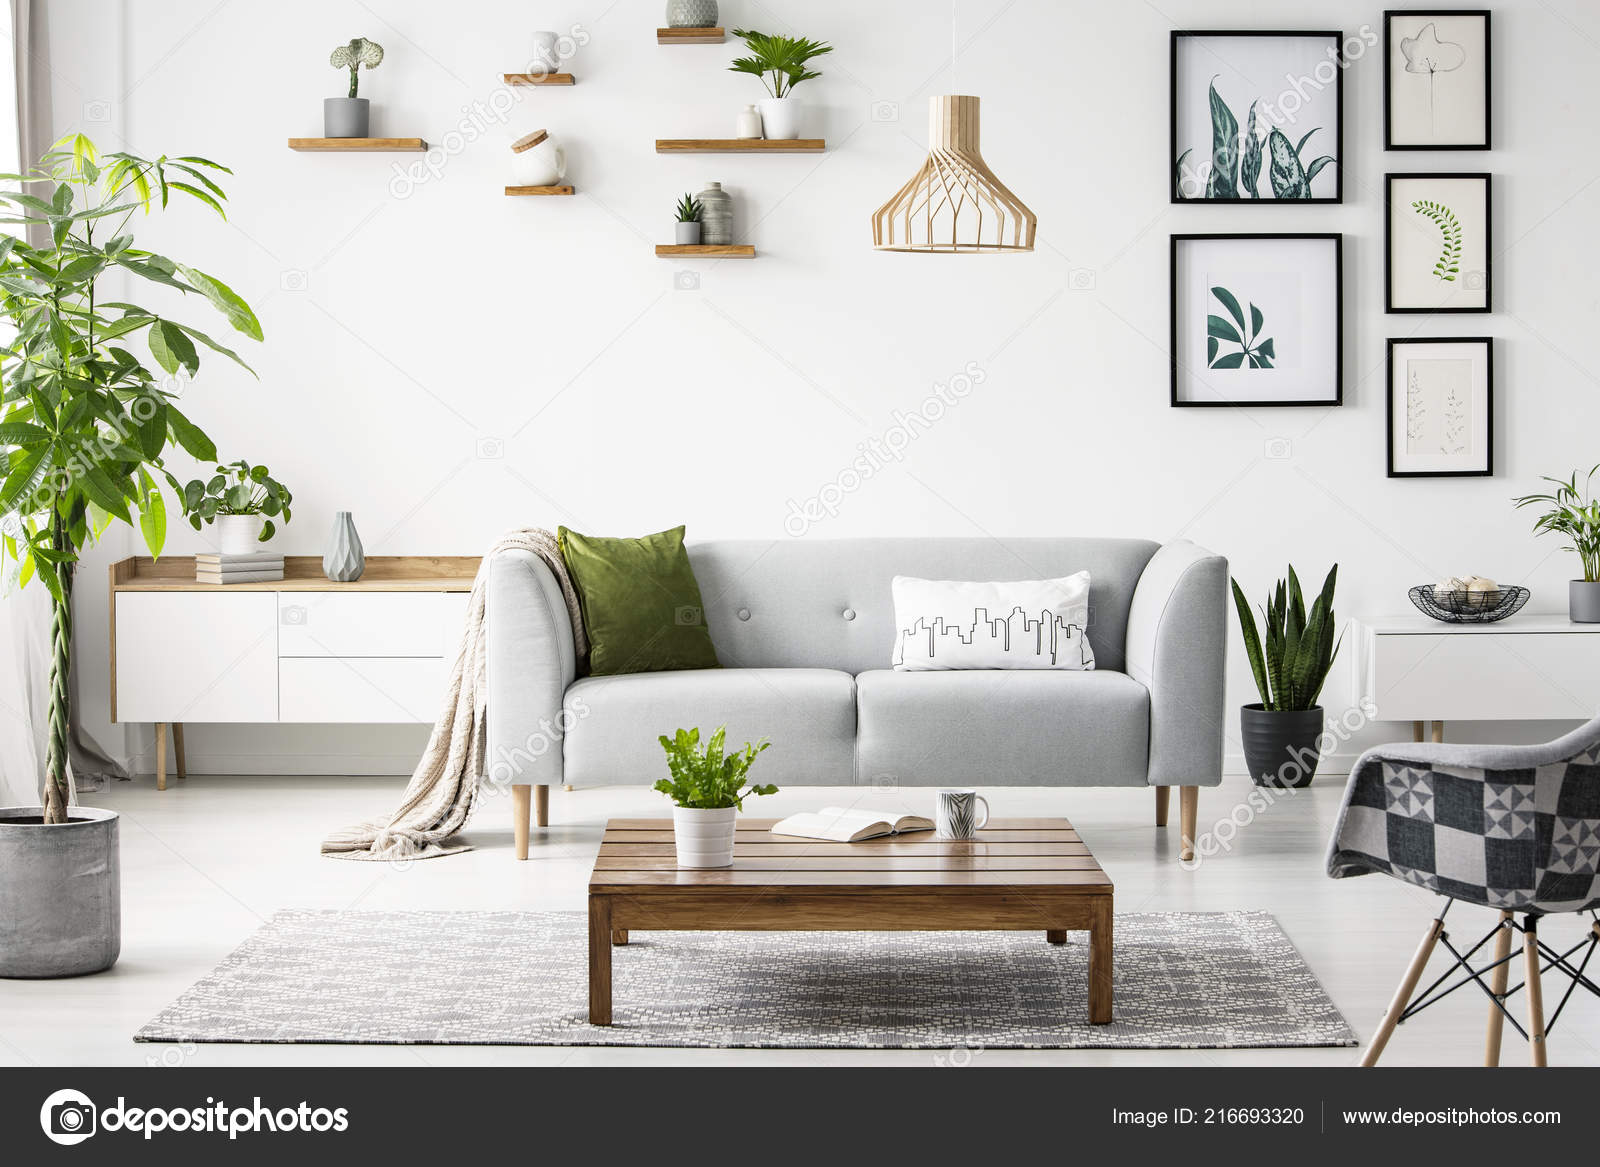 Flowers Wooden Table Front Grey Sofa Scandi Flat Interior Posters Stock Photo C Photographee Eu 216693320